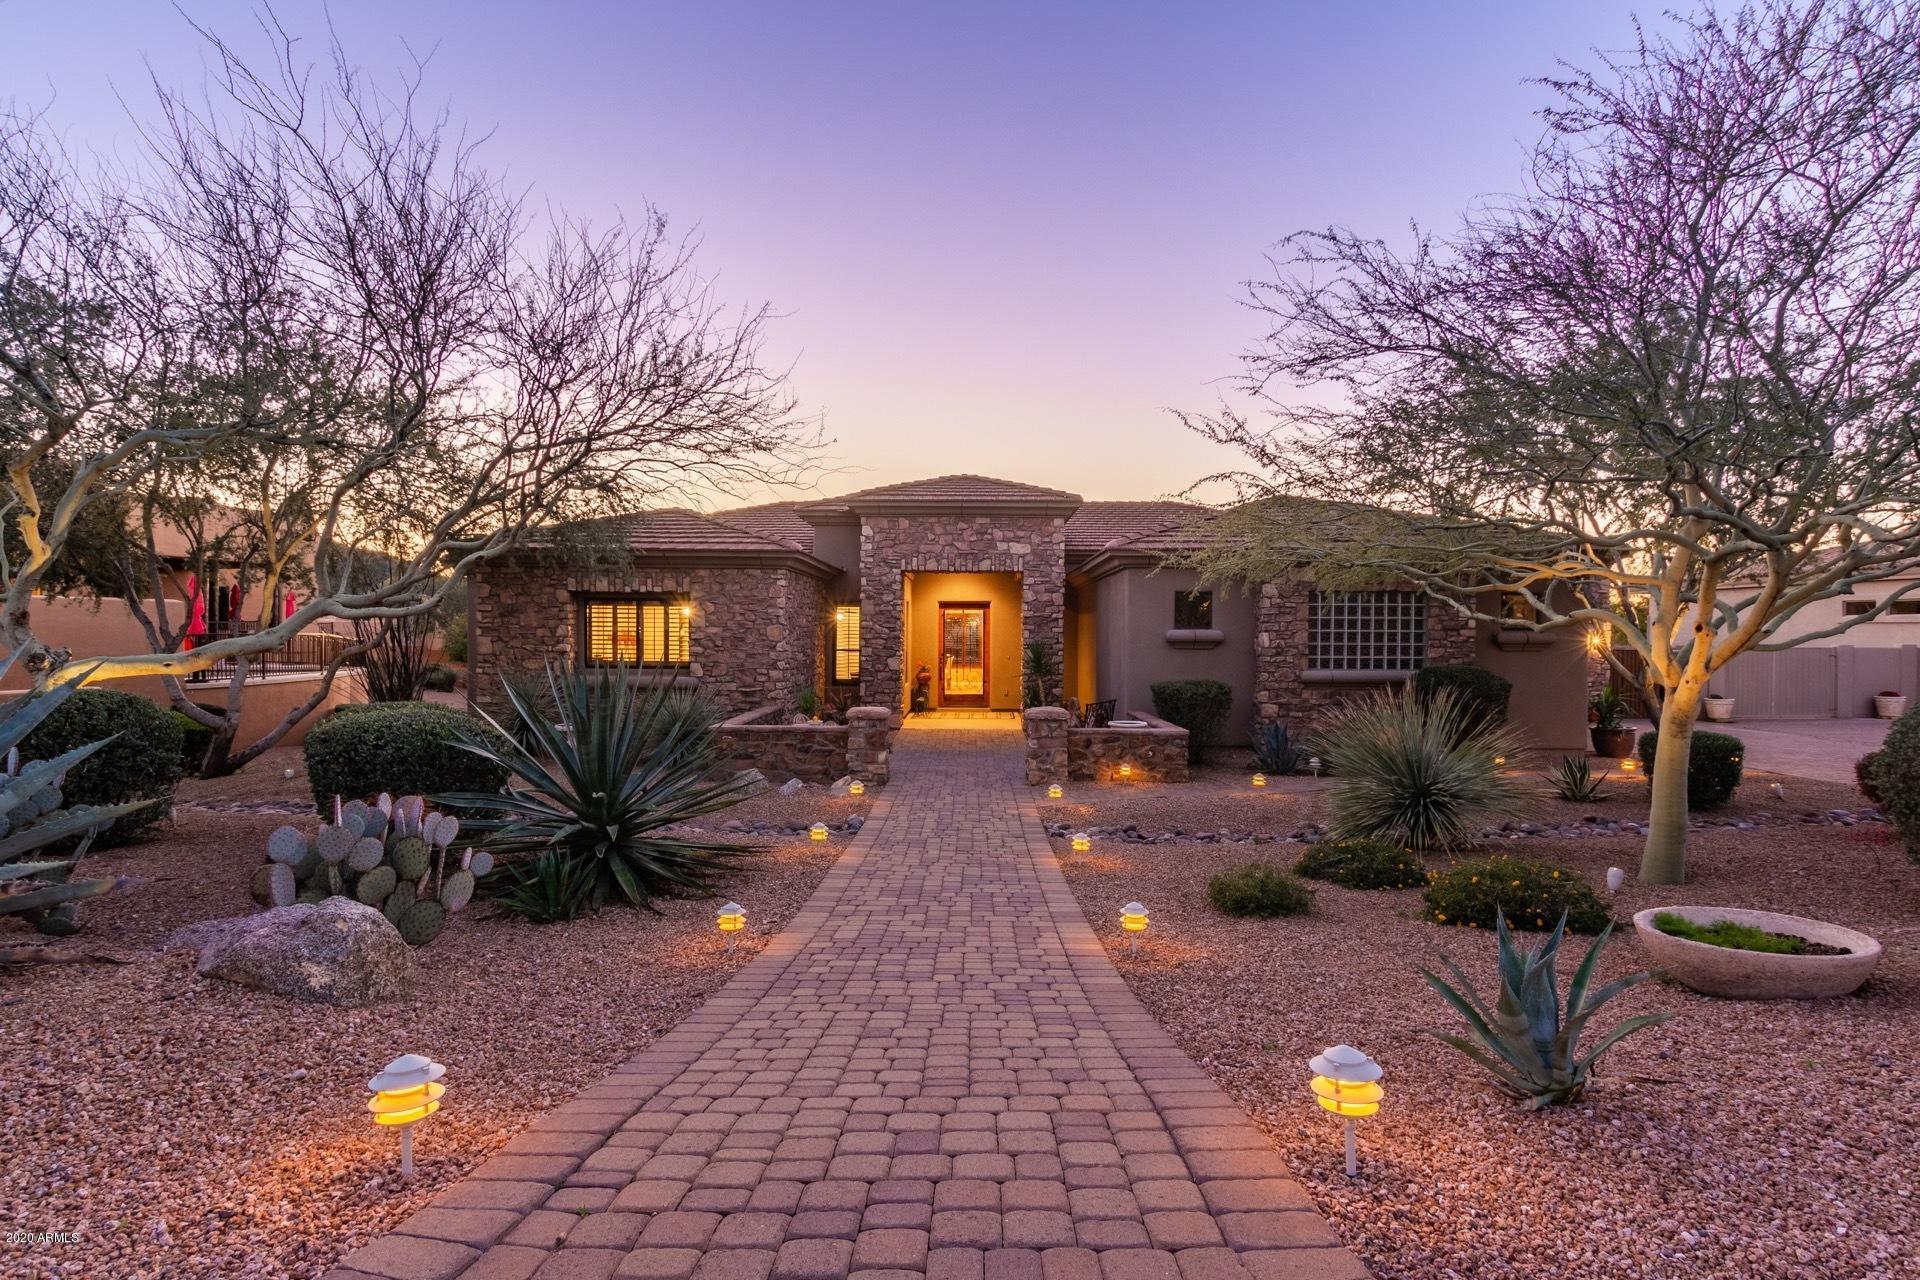 Photo of 3742 N AVOCA --, Mesa, AZ 85207